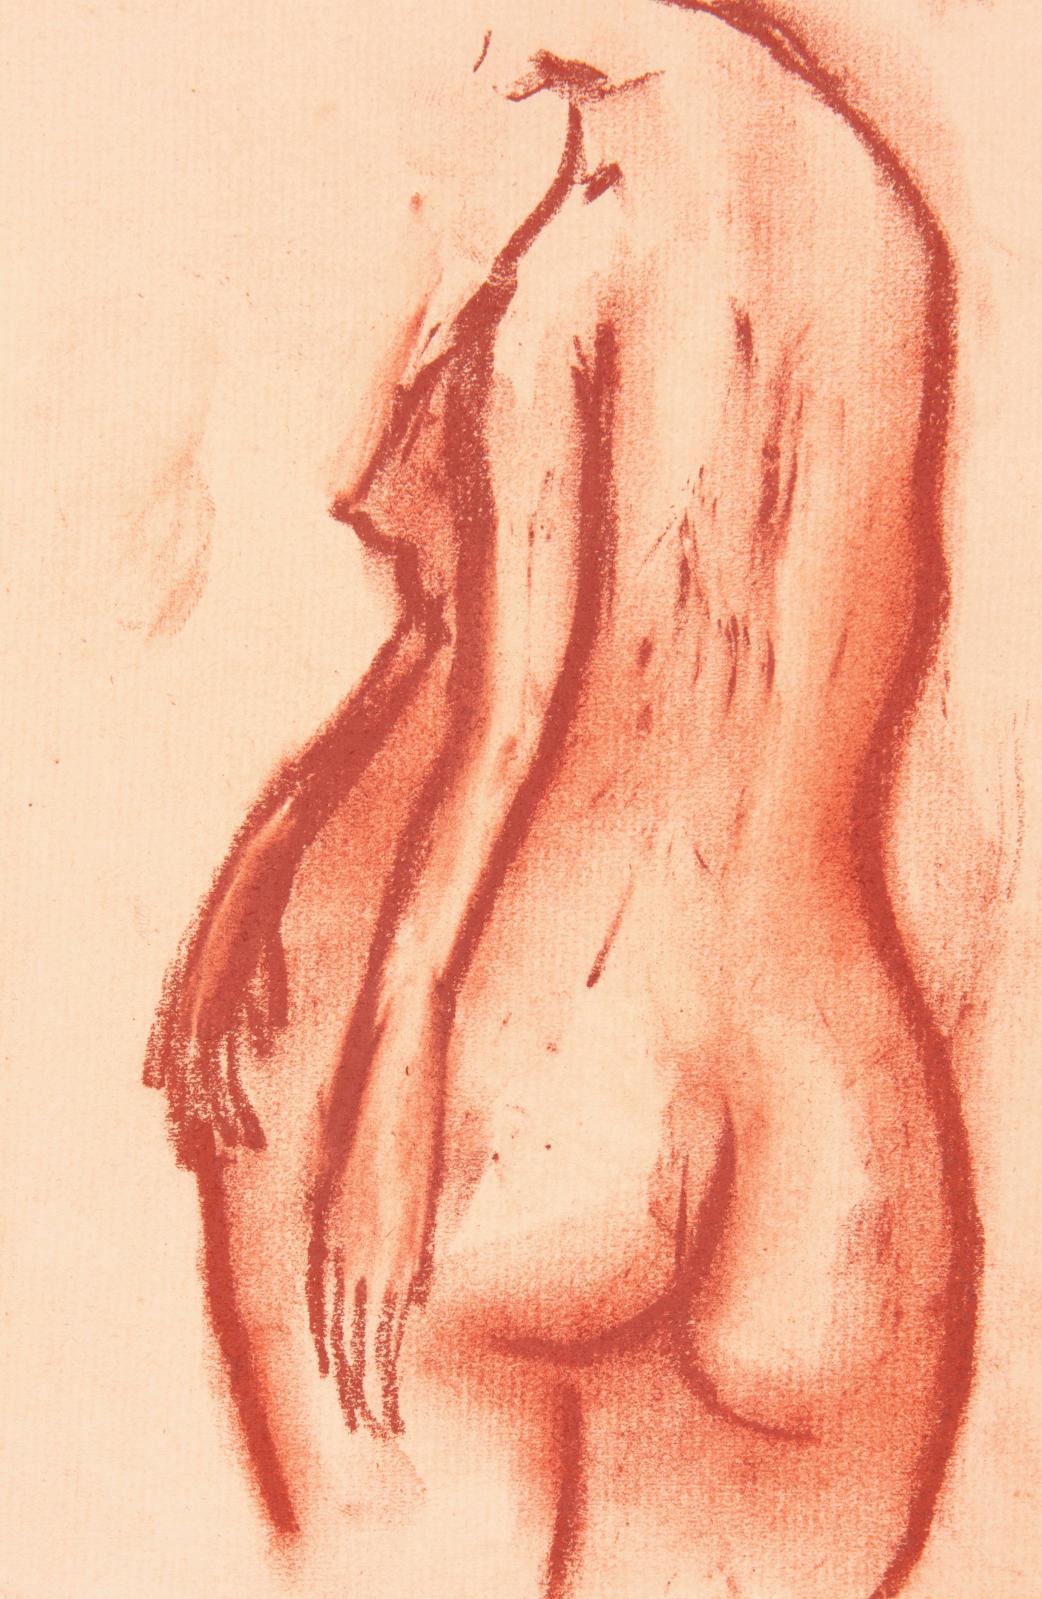 Zao Wou-ki, Sans titre, sanguine, vers 1948, donation Zao Wou-ki au musée Cernuschi.